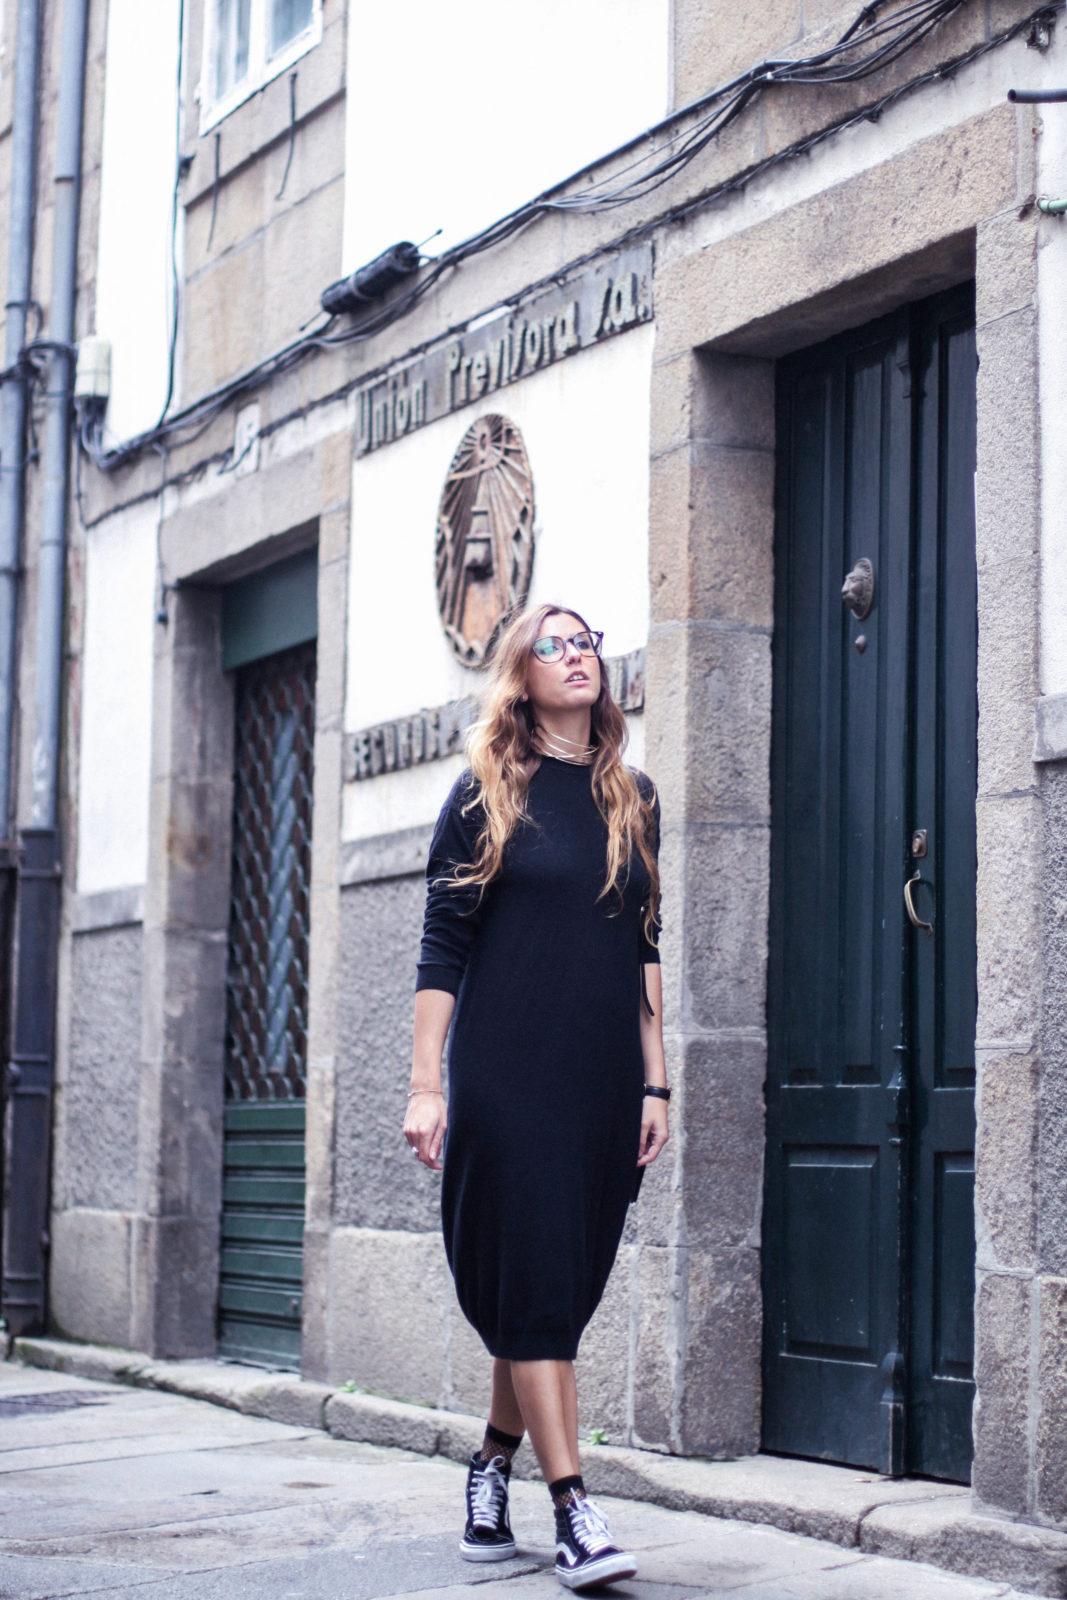 vestido_de_punto_midi_vans_calcetines_rejilla_choker_metalico_happiness_boutique_abrigo_largo_gucci_street_style_fall_2016_donkeycool-46